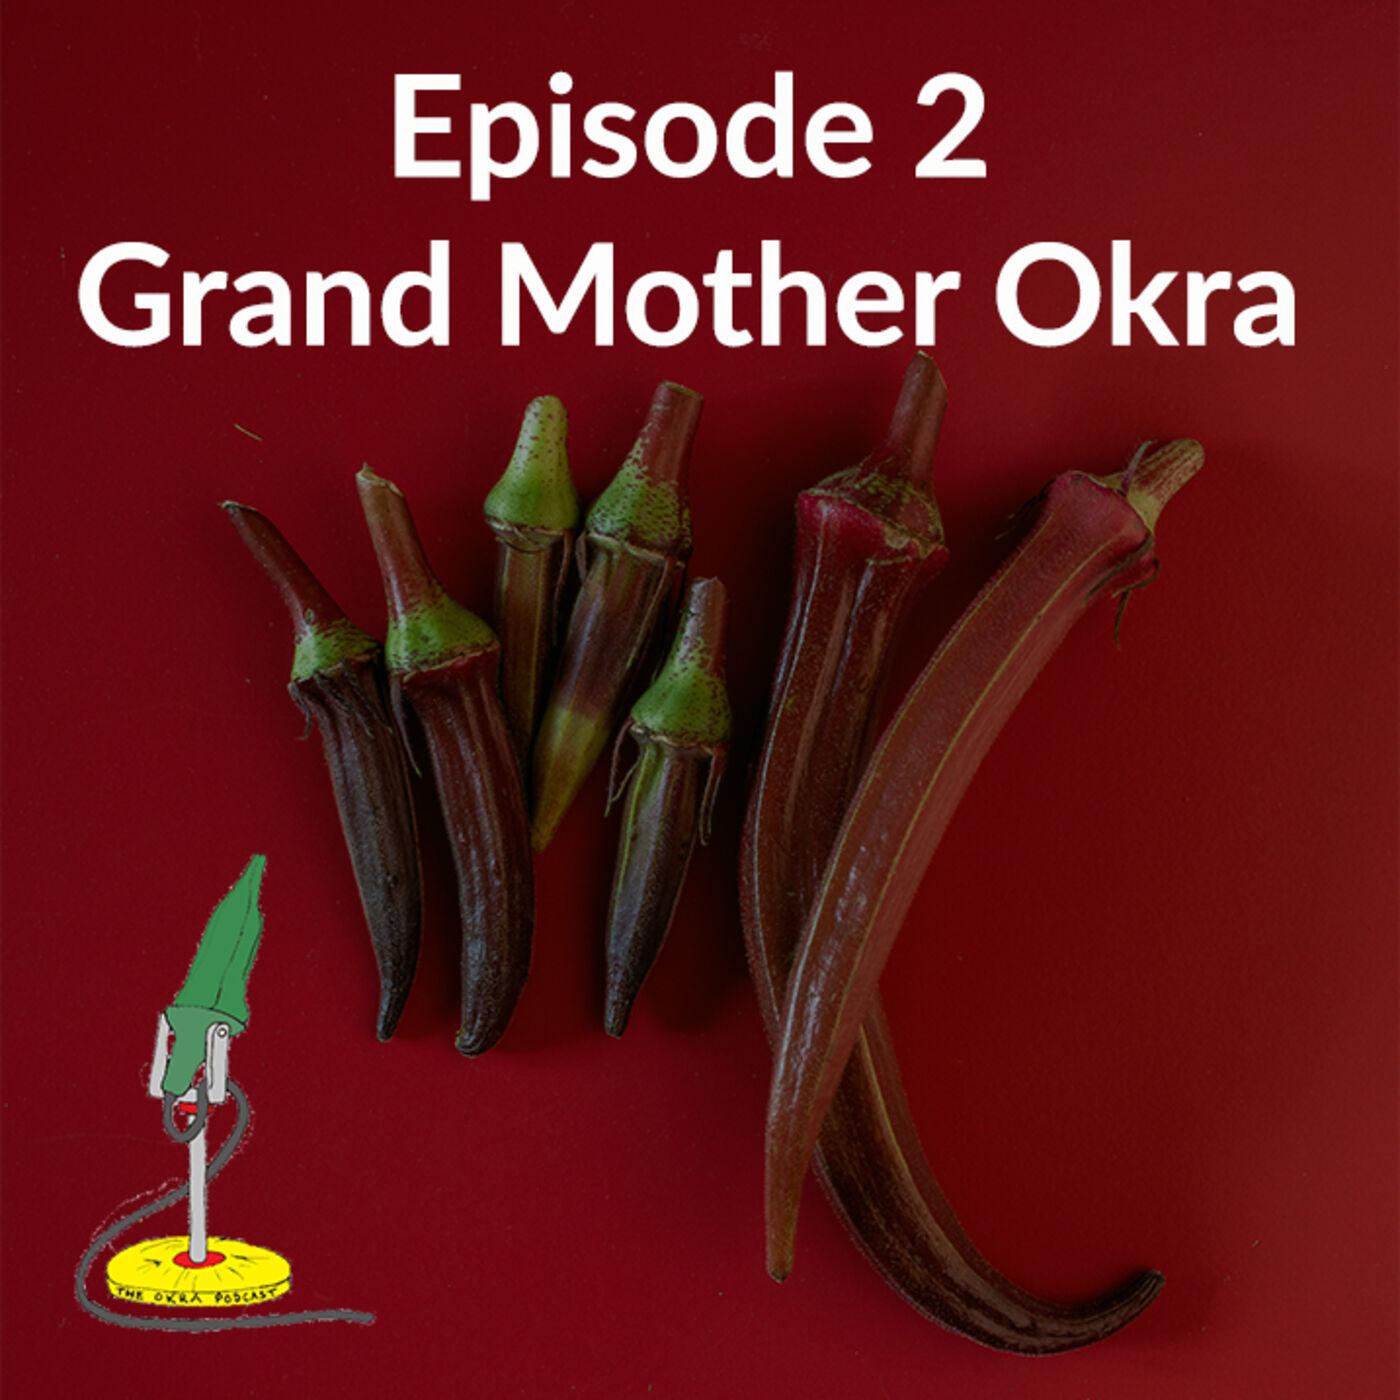 Grand Mother Okra (featuring Mehmet Oztan and Vivien Sansour)